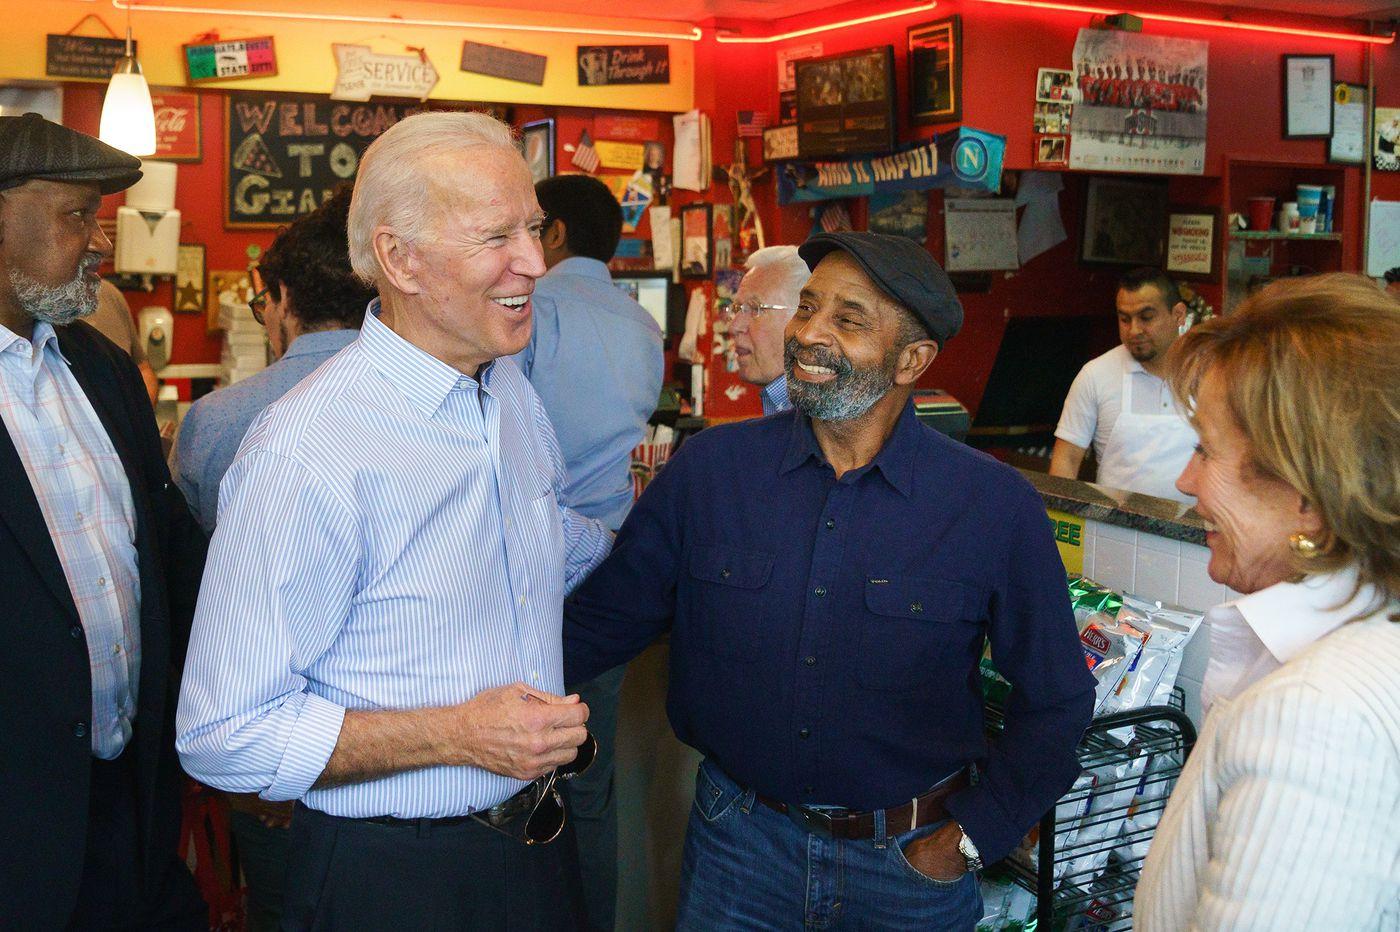 Joe Biden announces details of Philadelphia rally May 18